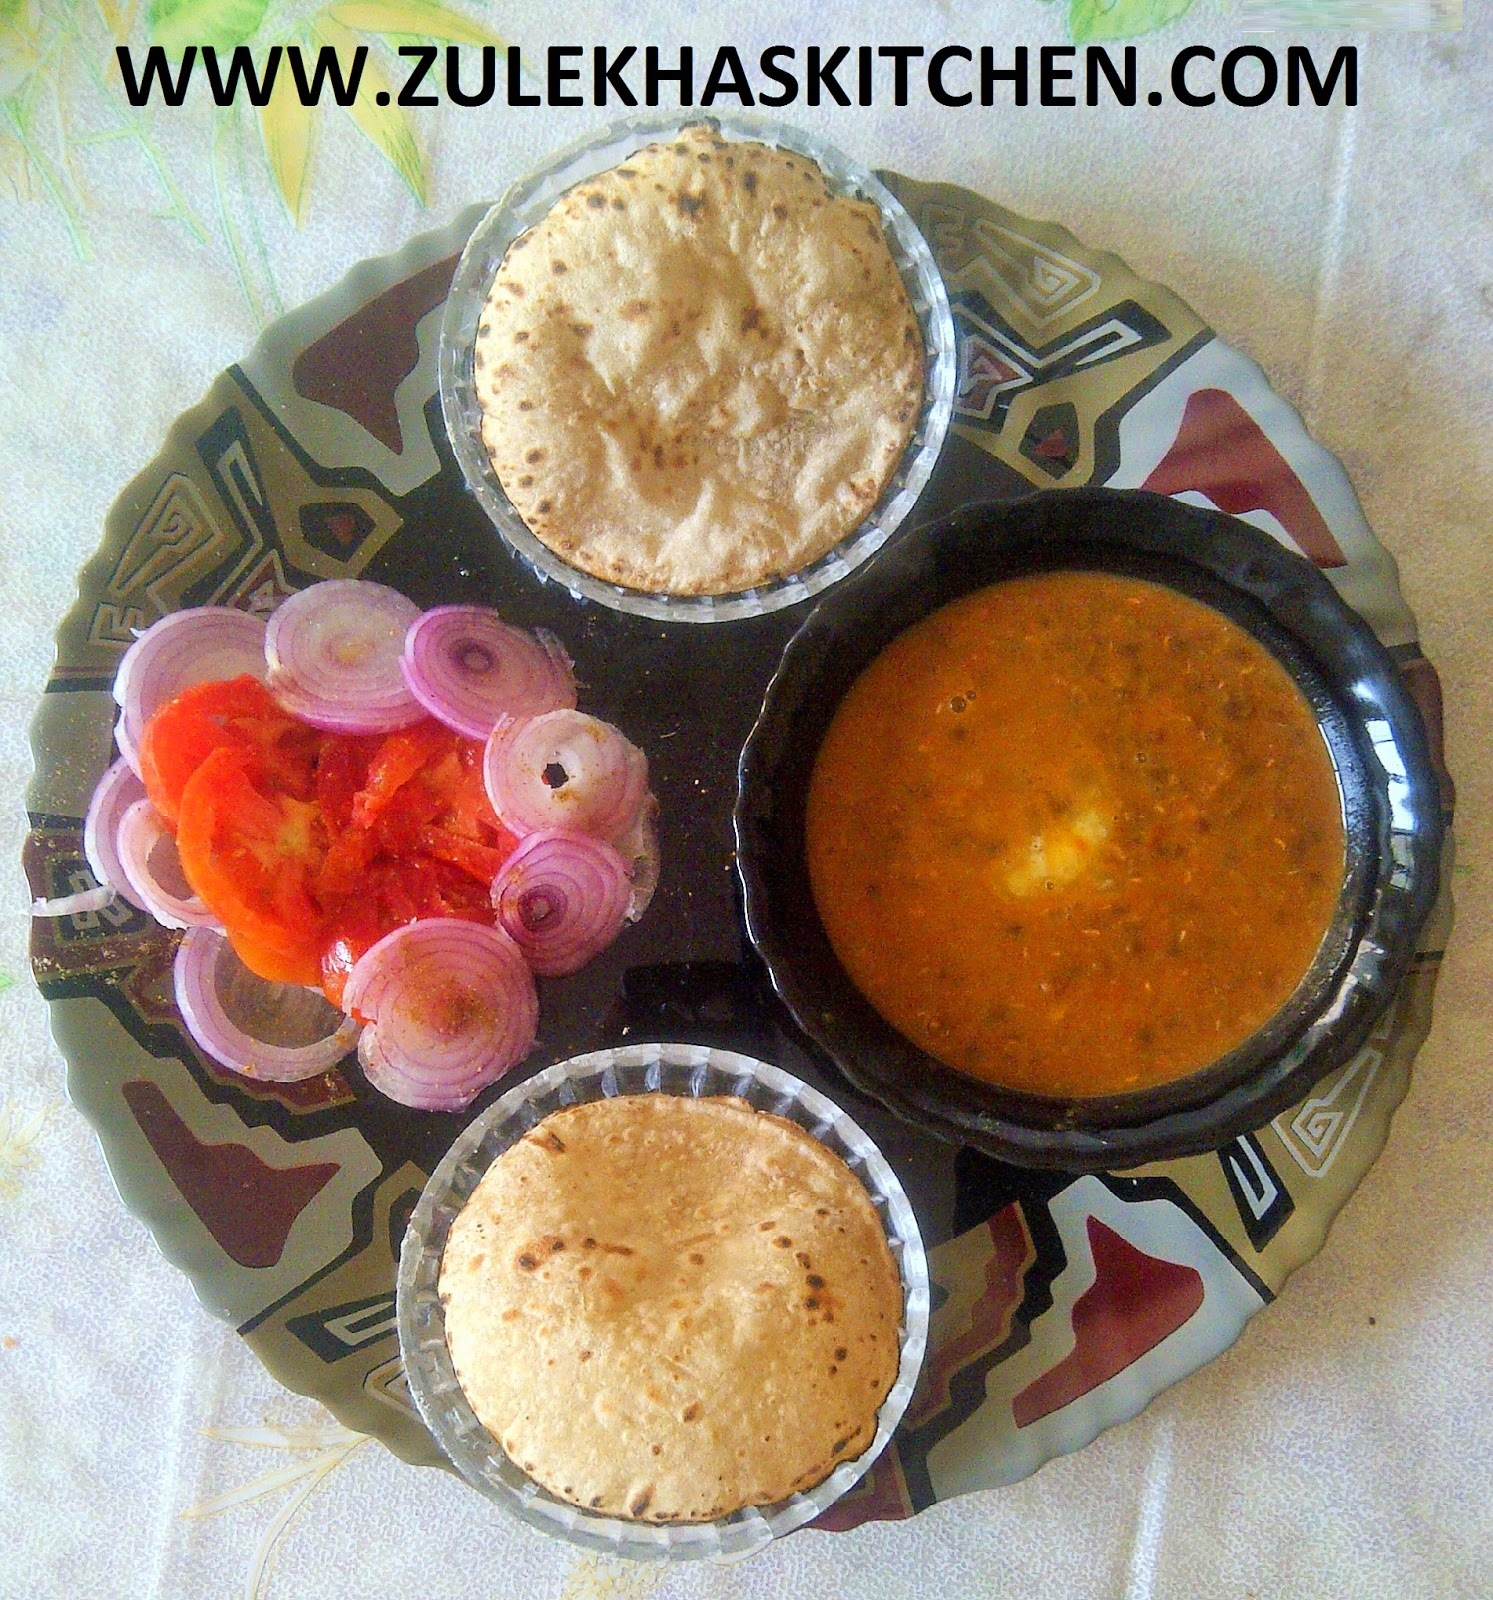 Recipe of daal makhani